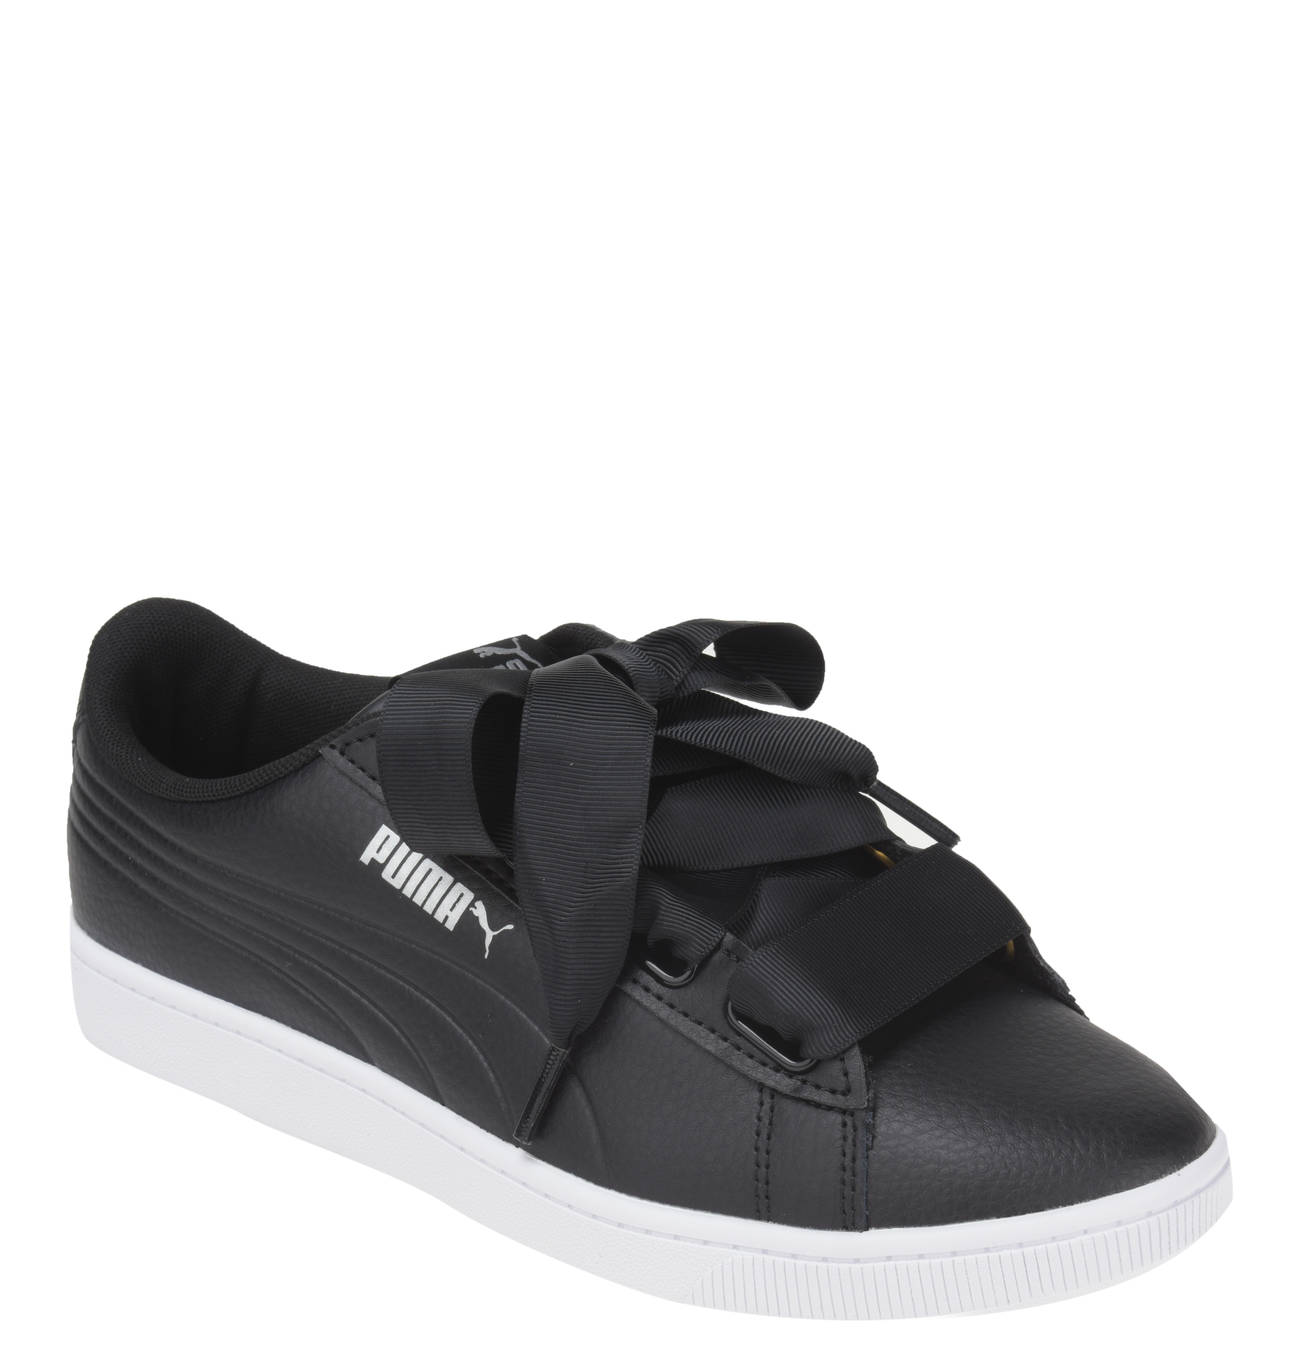 Vikky V2, Damen Sneakers